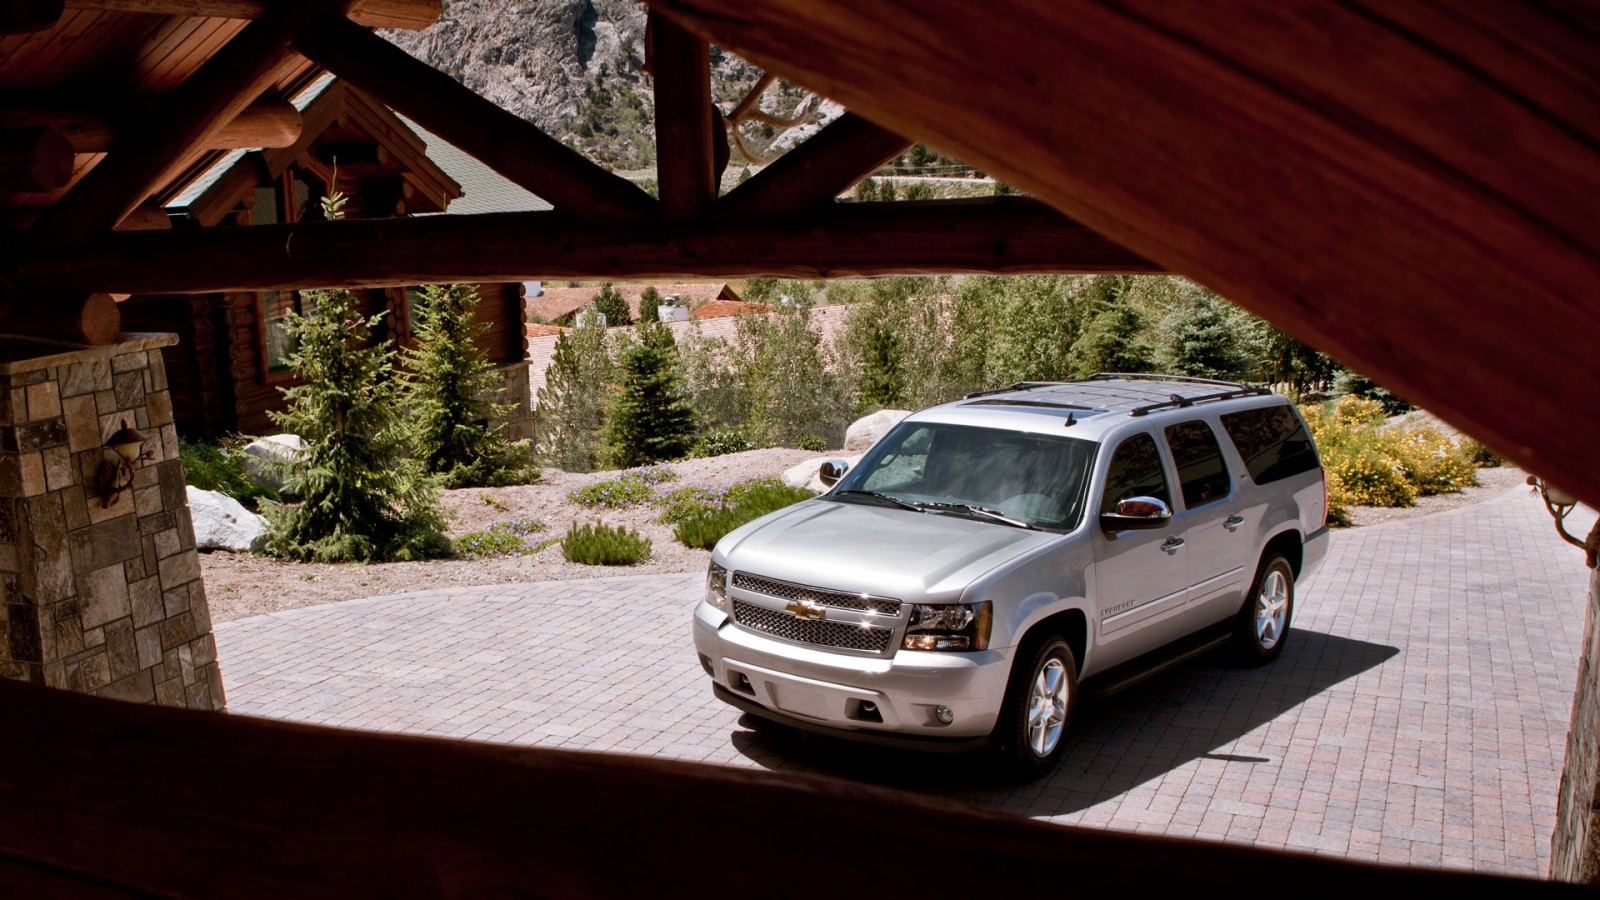 http://3.bp.blogspot.com/-R9oEZsLuQwQ/UJXJTxXCBPI/AAAAAAAAHK8/CXyH1bmECn8/s1600/Chevrolet-Suburban-SUV-2013-exterior-front-side-view-silver-white.jpg